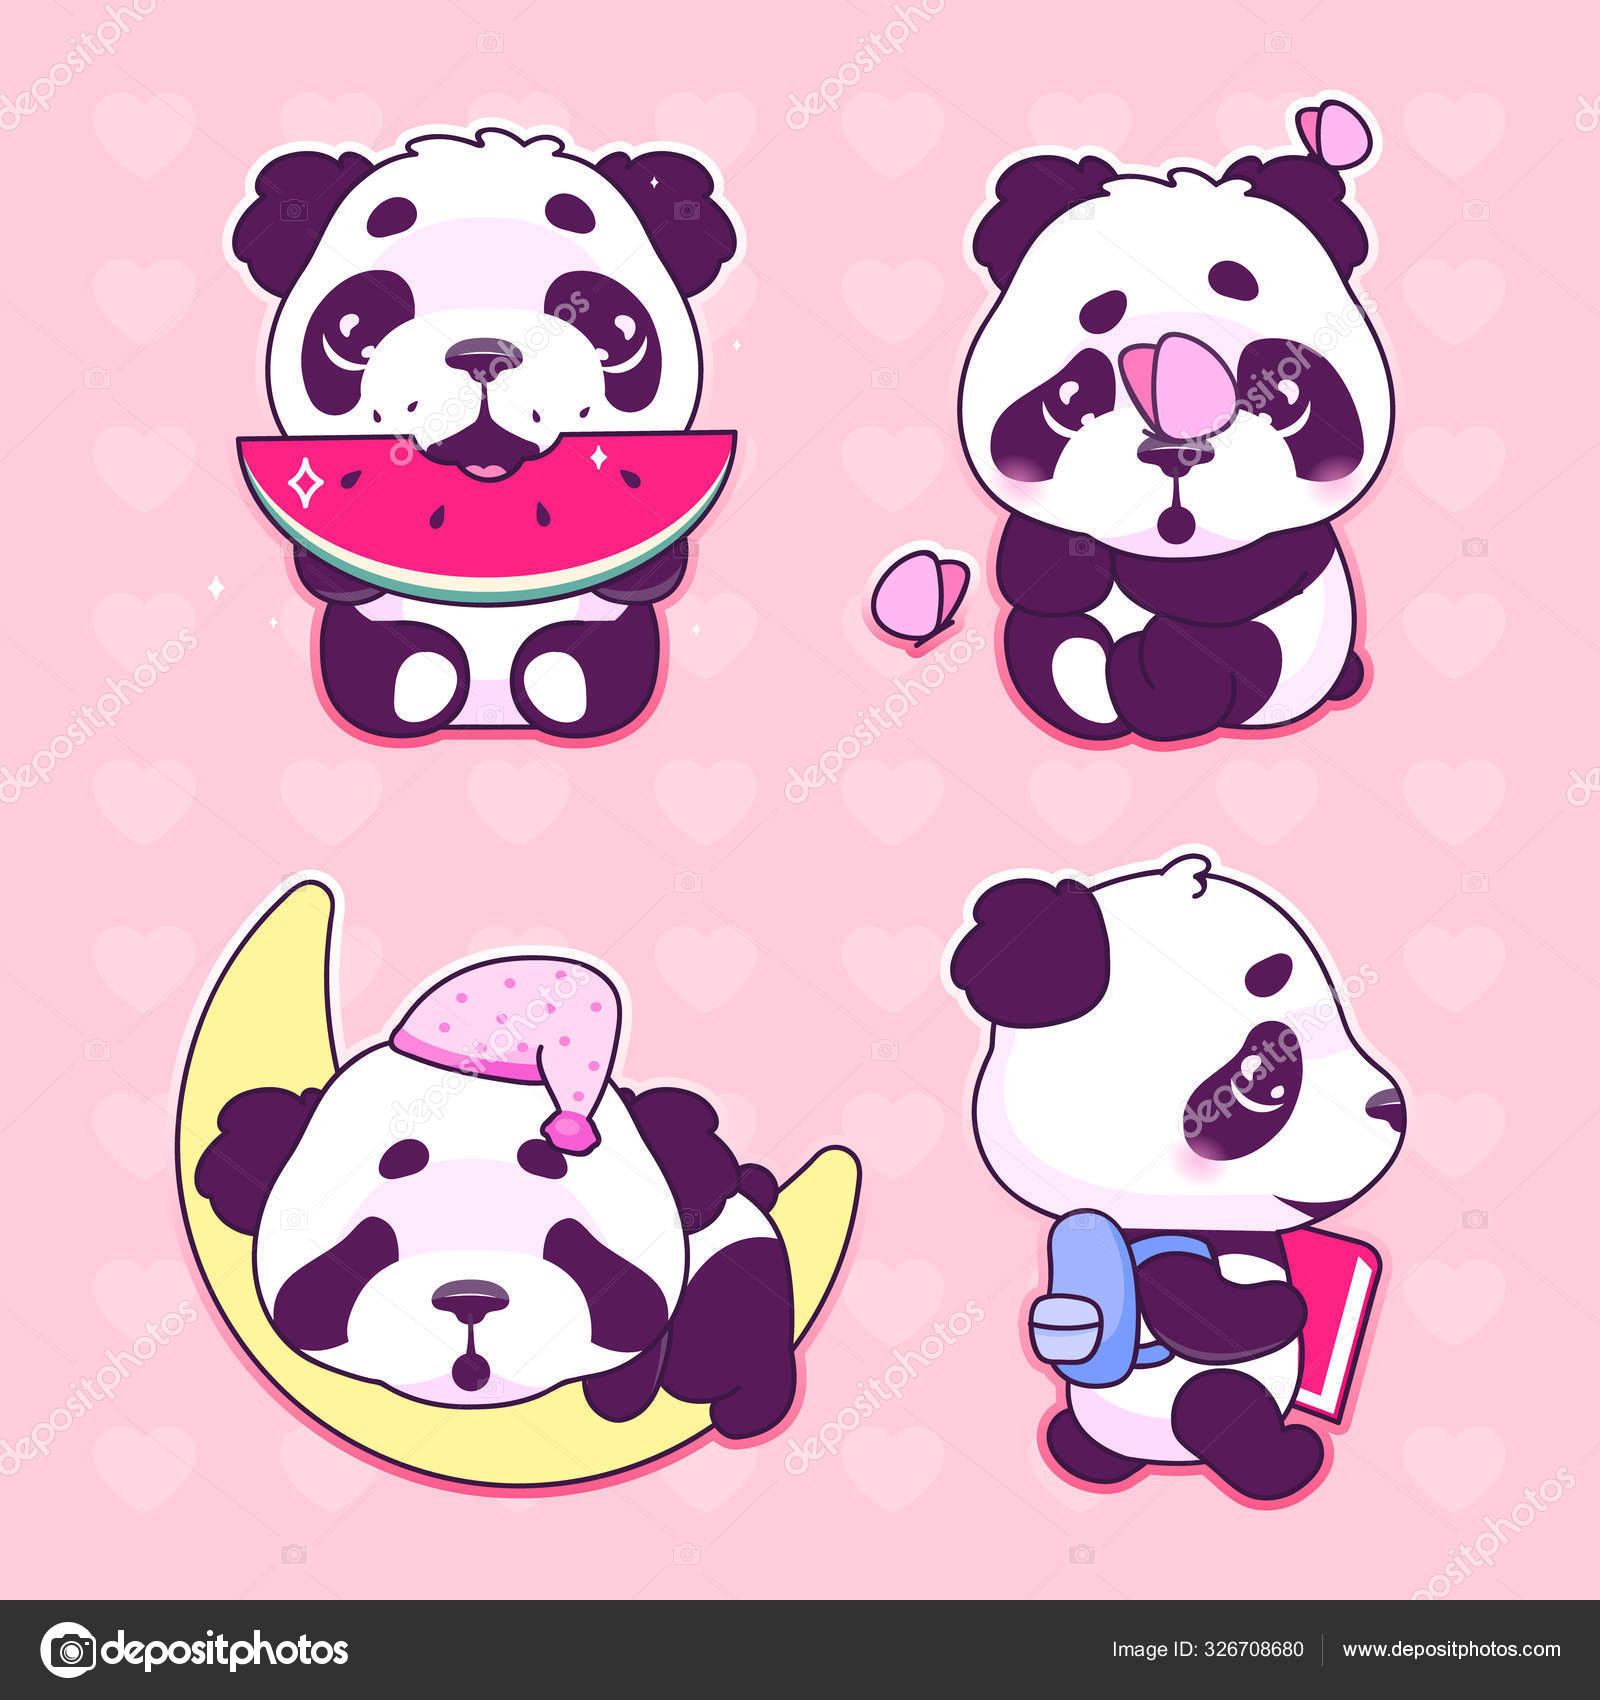 Cute Panda Kawaii Cartoon Vector Characters Set Adorable And Funny Animal Eating Watermelon Sleeping On Moon